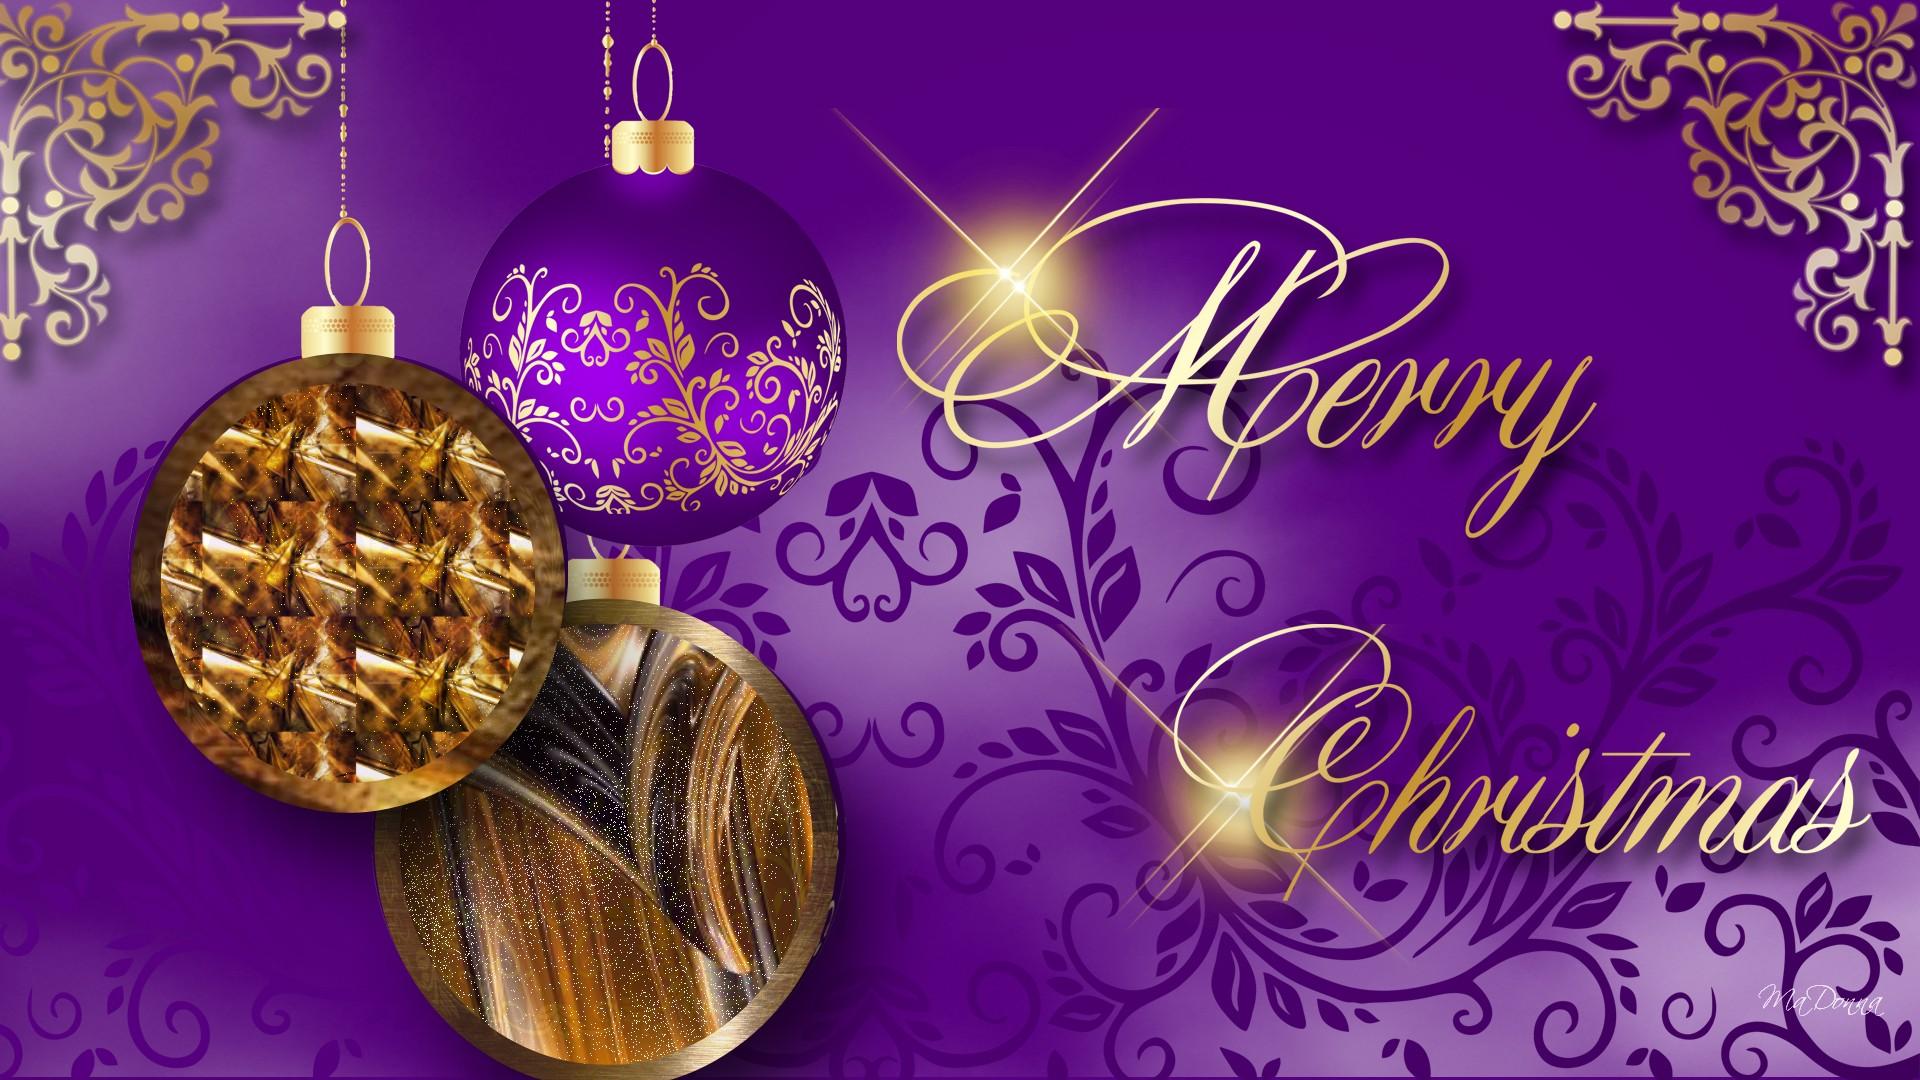 Christmas Purple and Gold wallpaper   ForWallpapercom 1920x1080